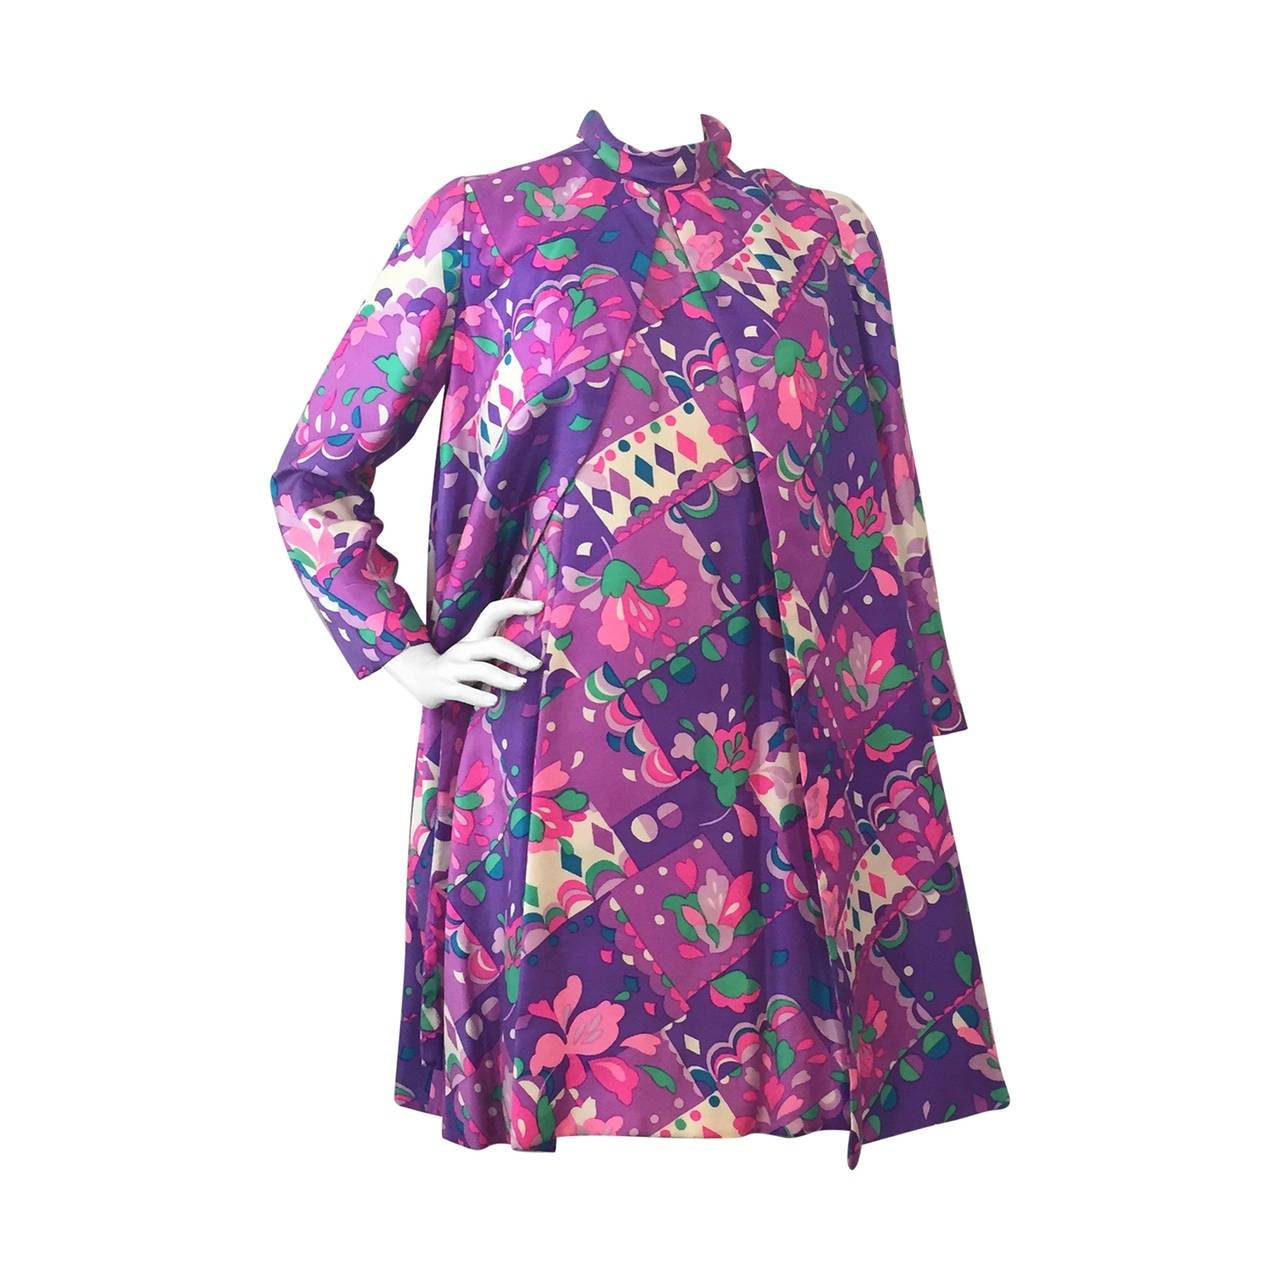 1960s Kiki Hart 2-Piece Silk Mod Print Mini Dress and Coat Ensemble